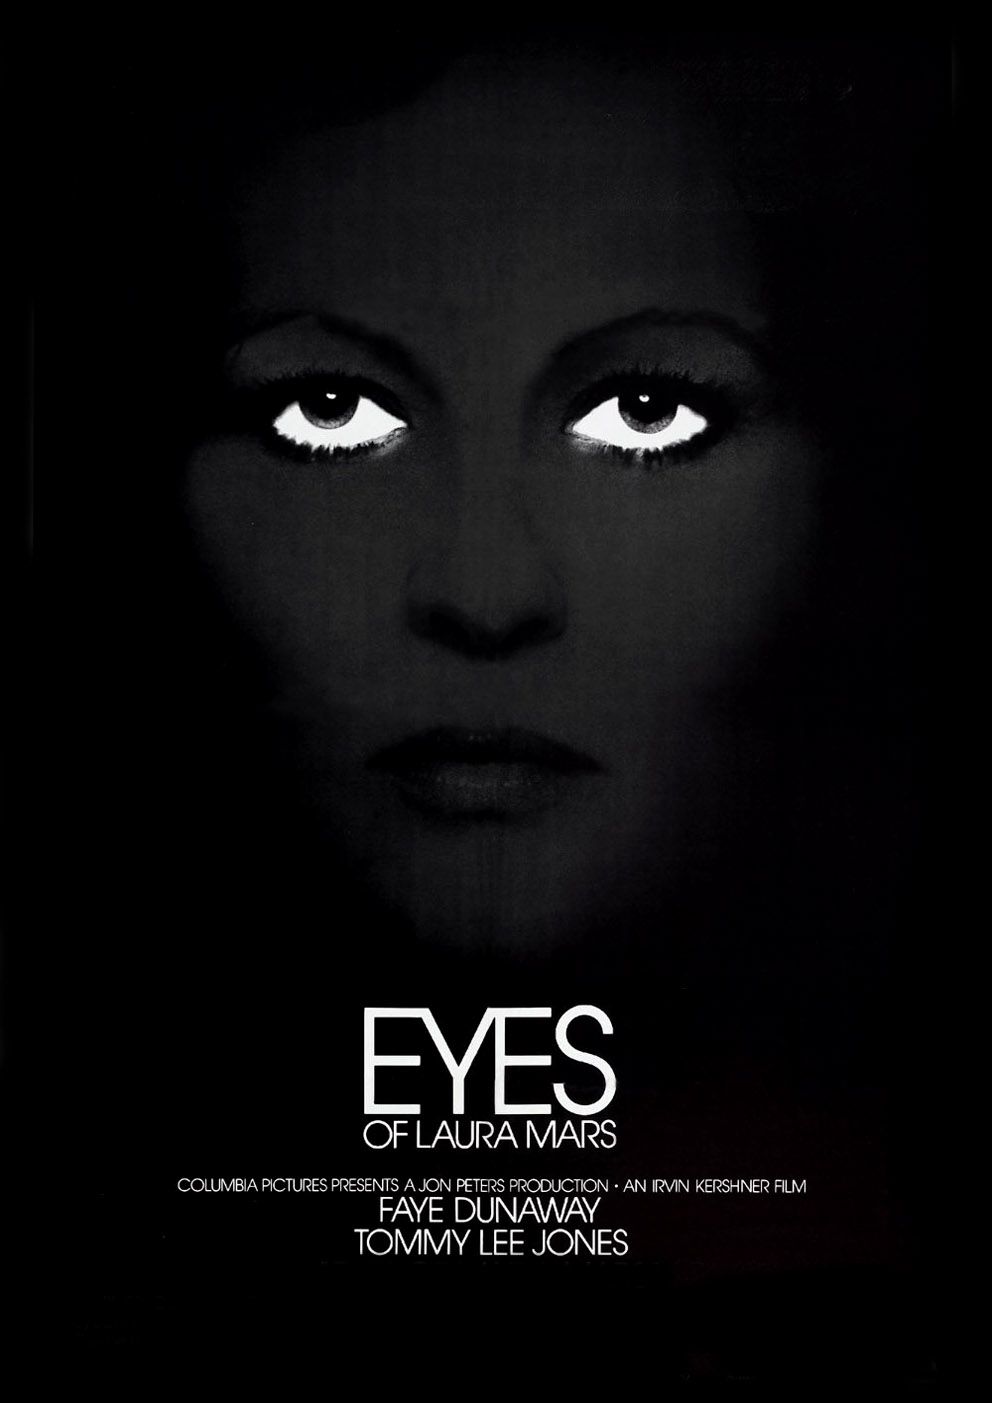 Lauras star movie poster